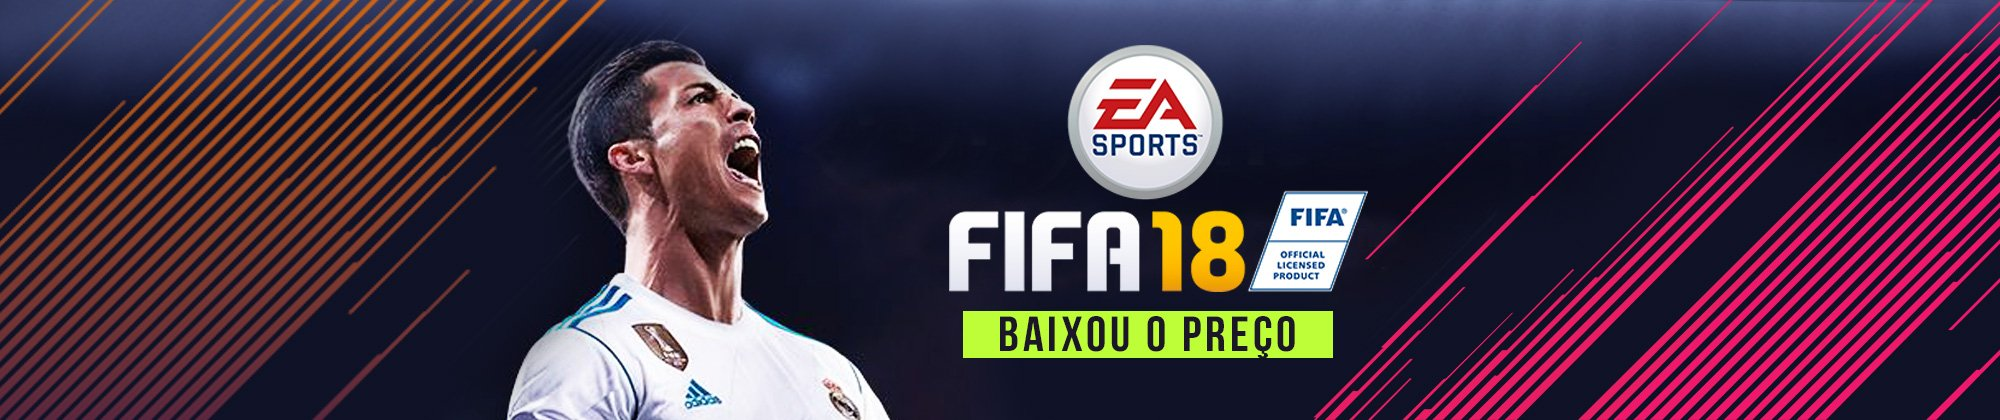 FIFA BAIXOU new